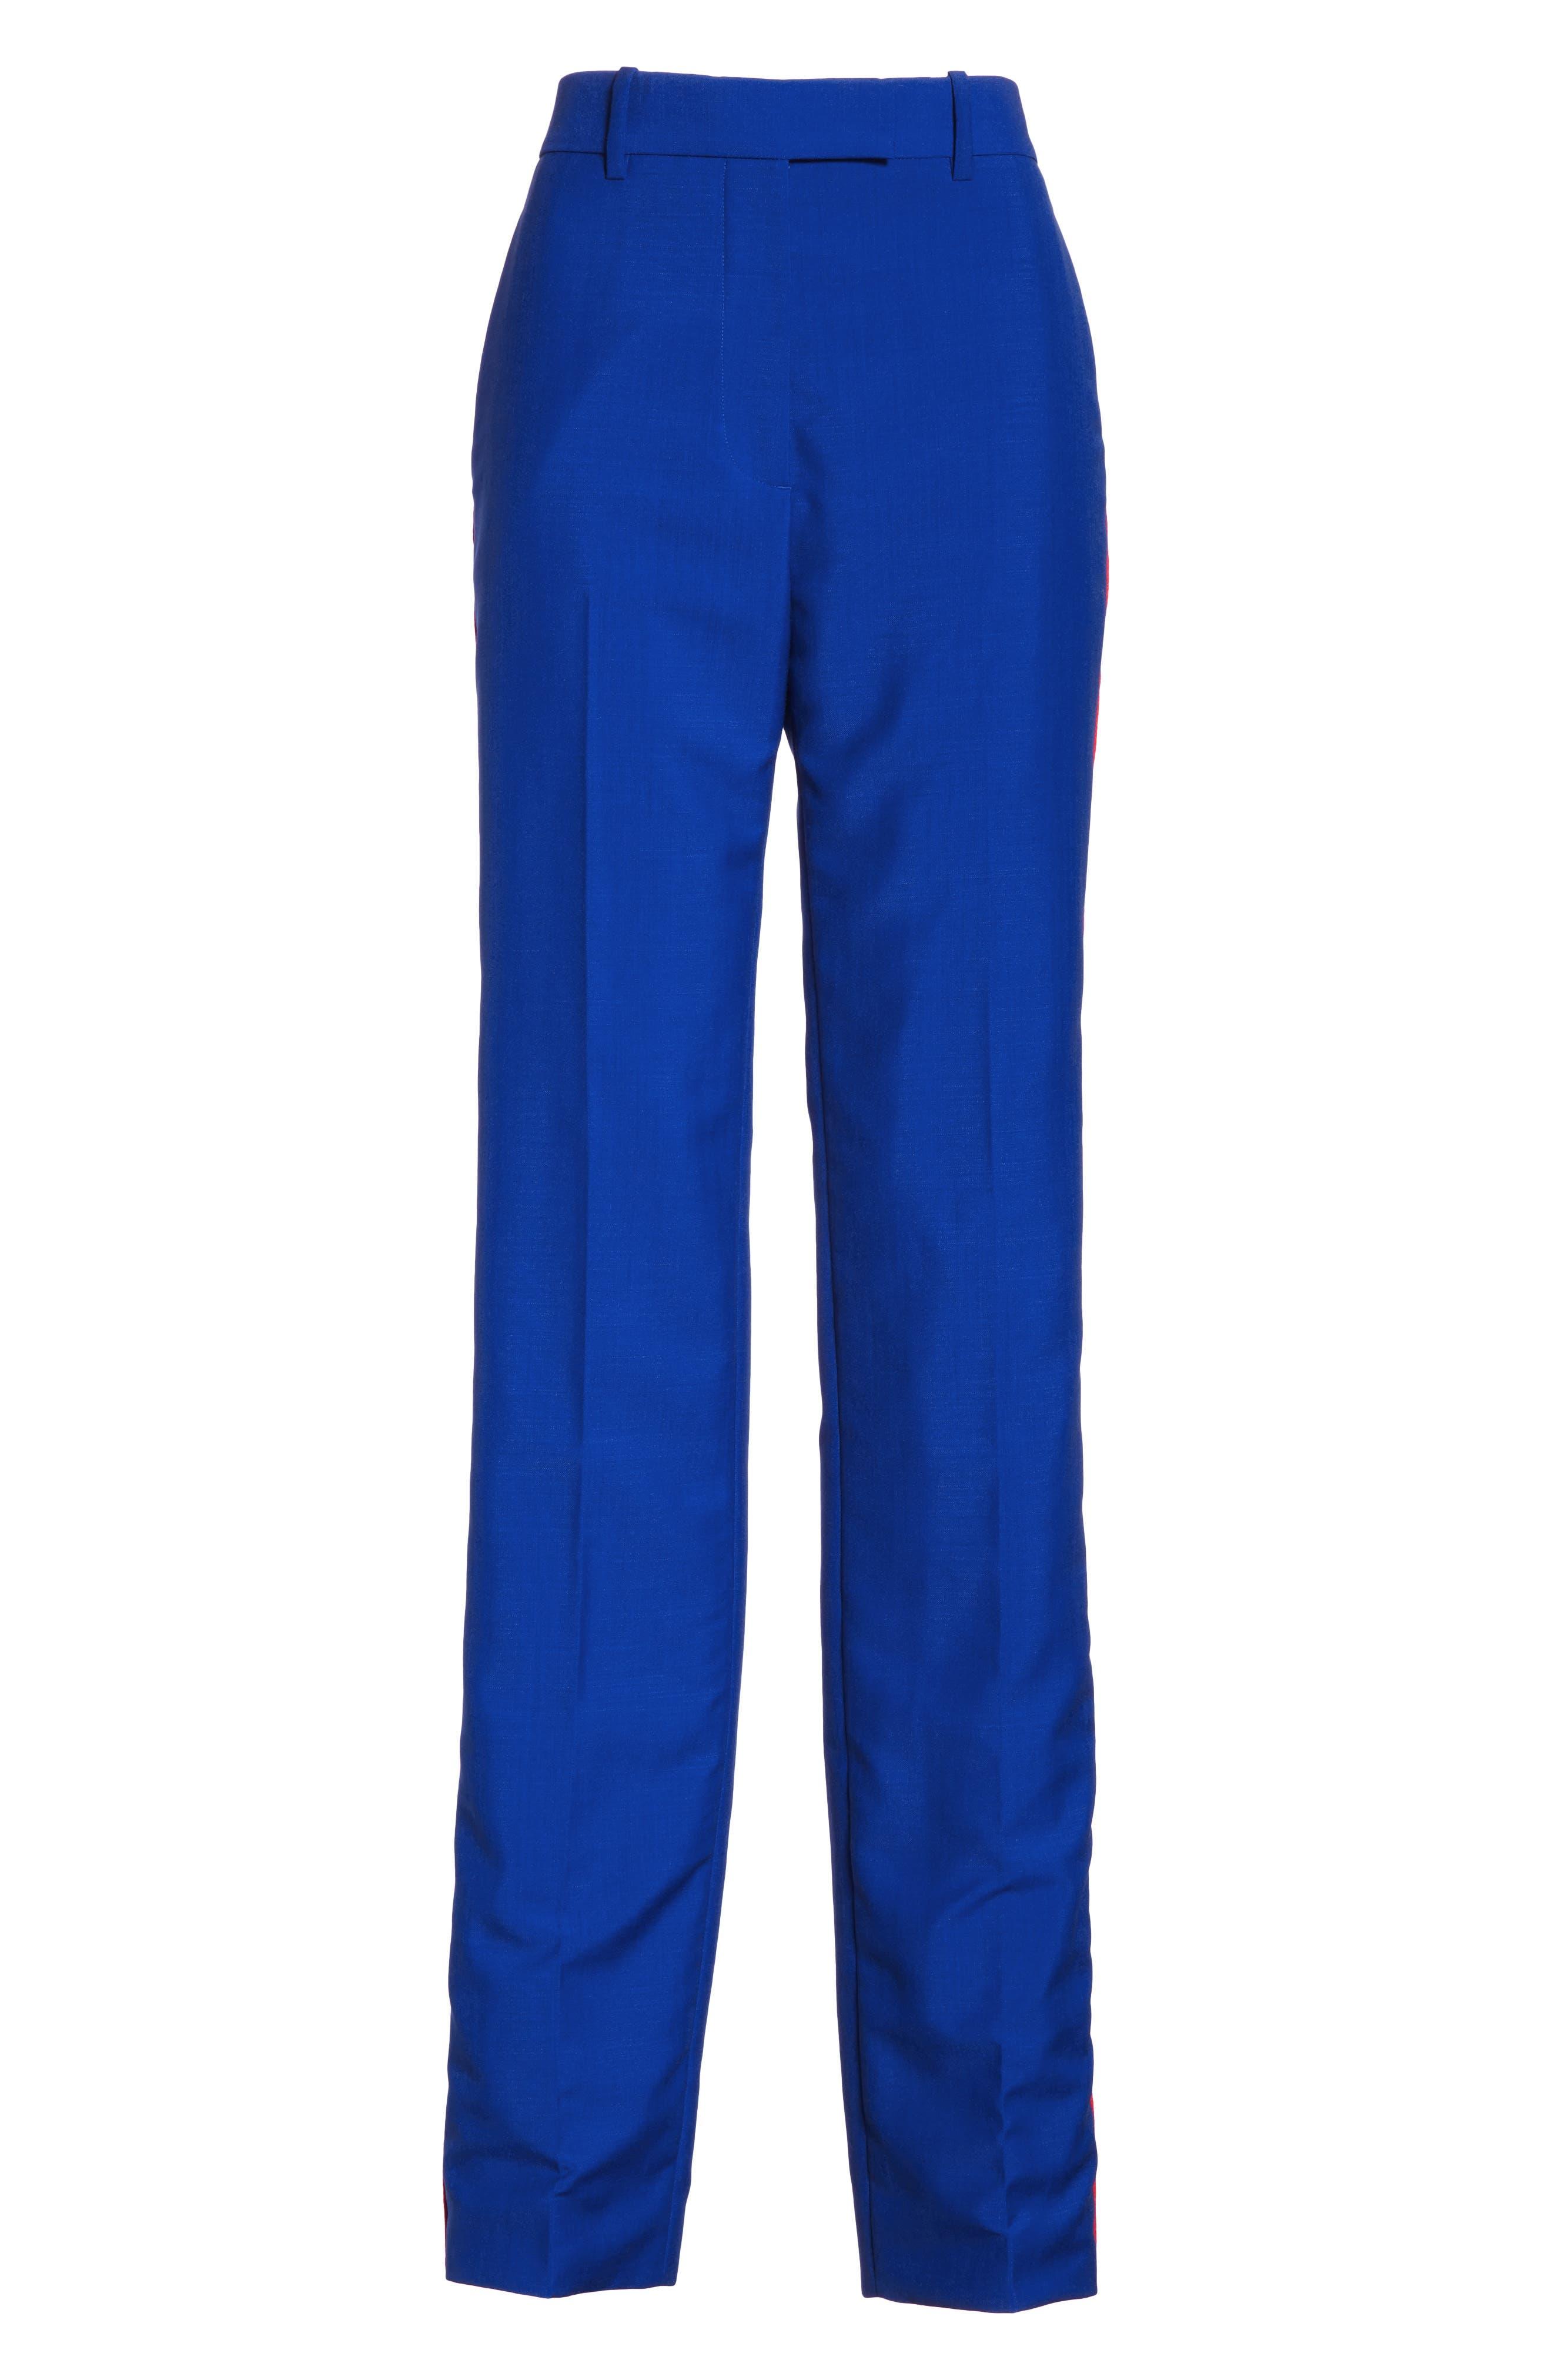 CALVIN KLEIN 205W39NYC, Side Stripe Mohair & Wool Straight Leg Pants, Alternate thumbnail 6, color, BRIGHT BLUE